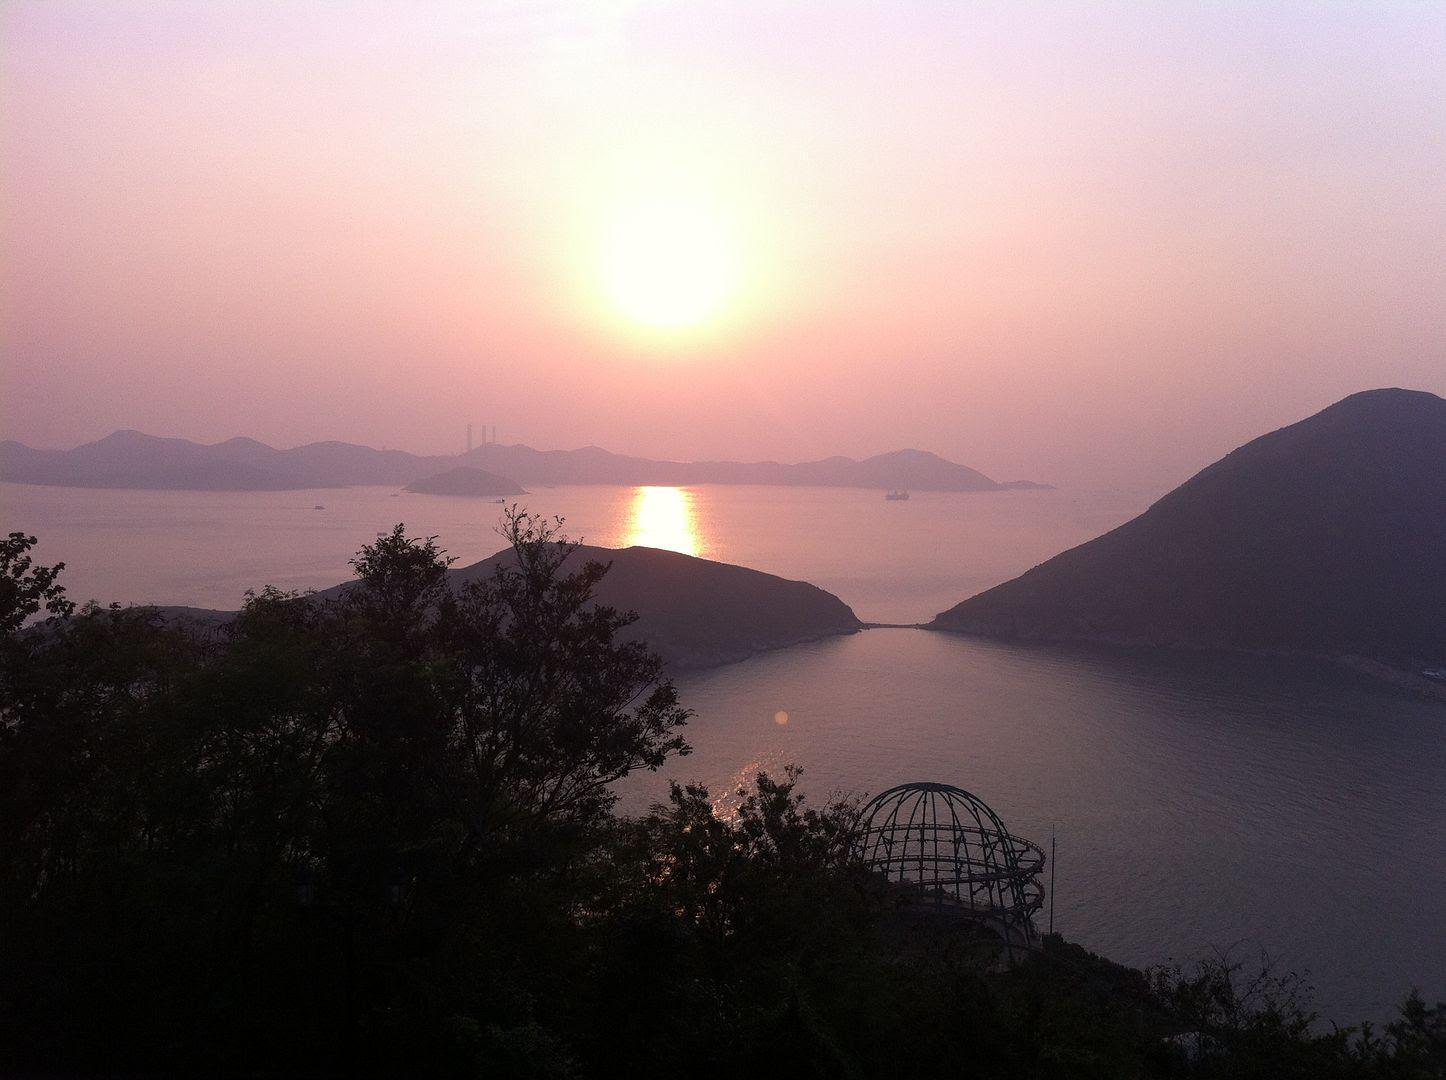 Sunset at Ocean Park in Hong Kong photo 2013-10-021738_zps87c65b81.jpg